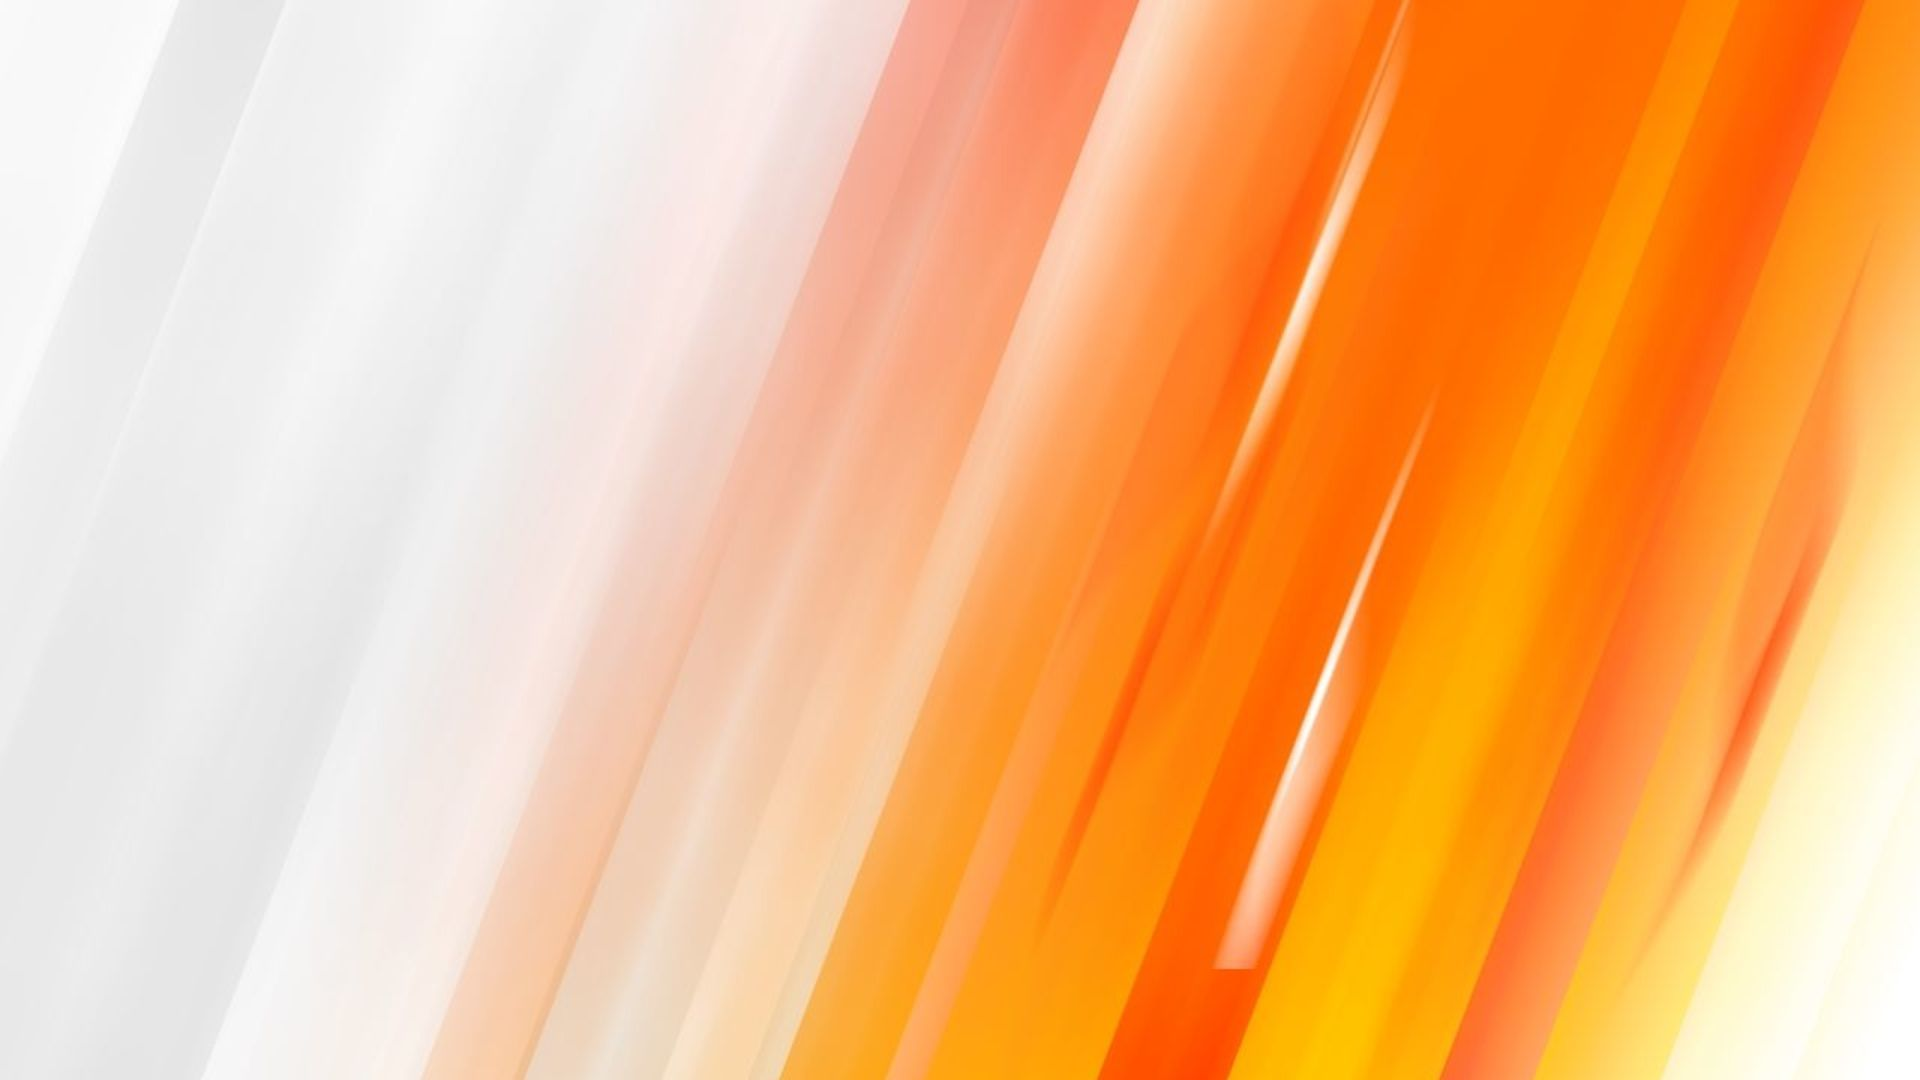 Orange download wallpaper image